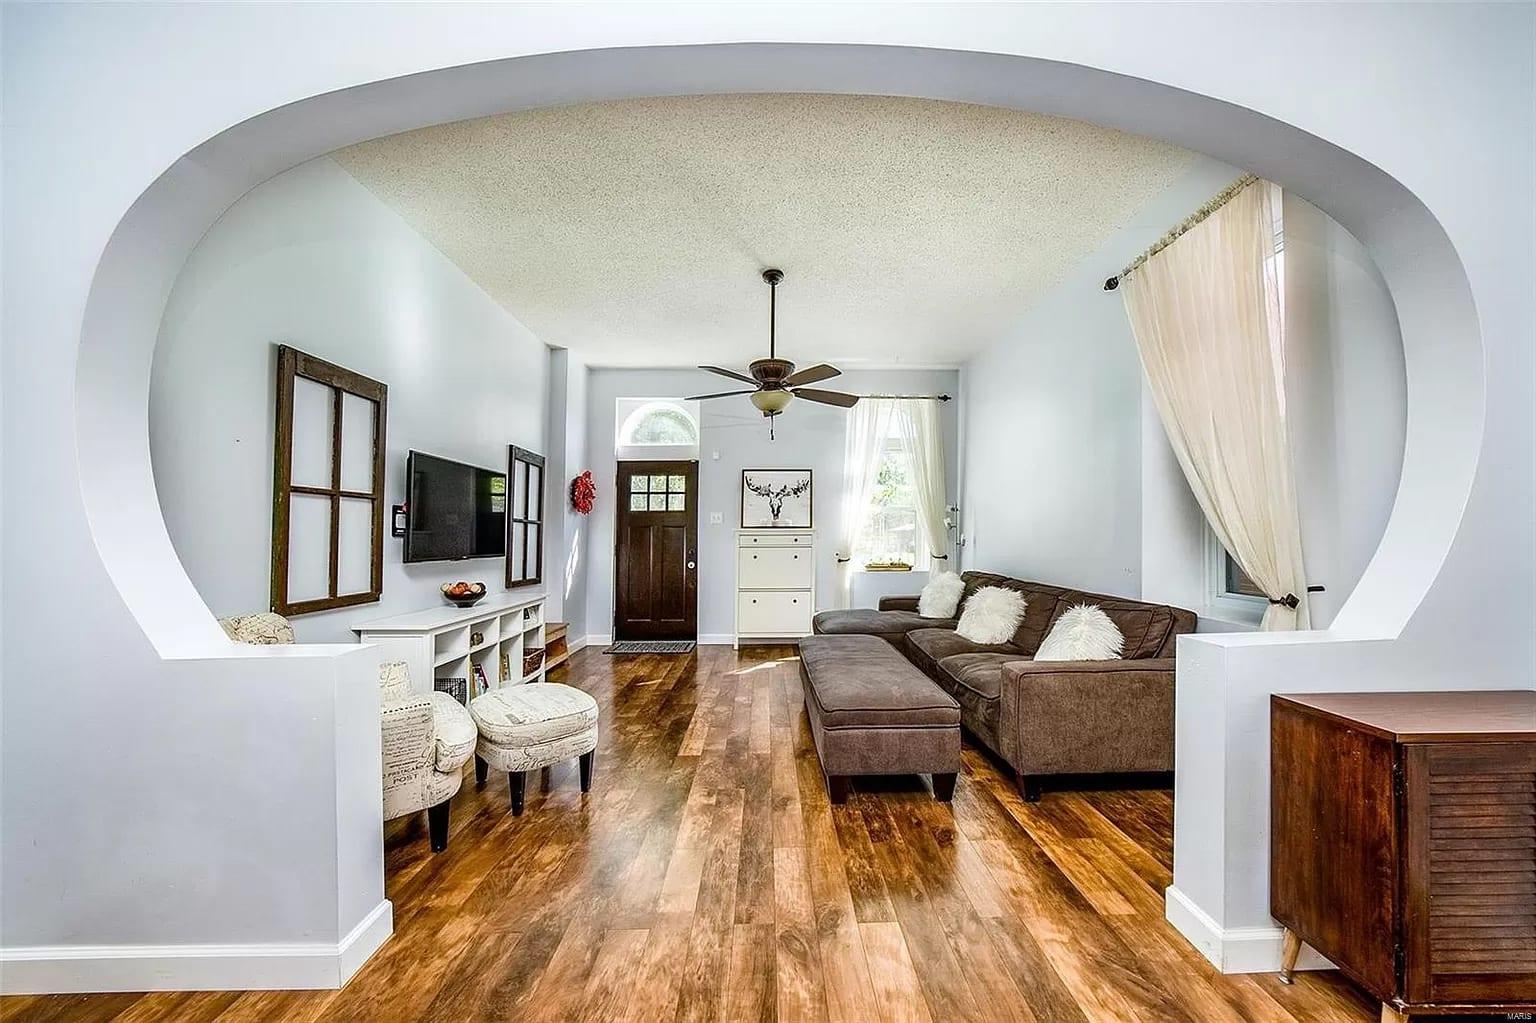 Real estate listing photos of 4217 Louisiana.